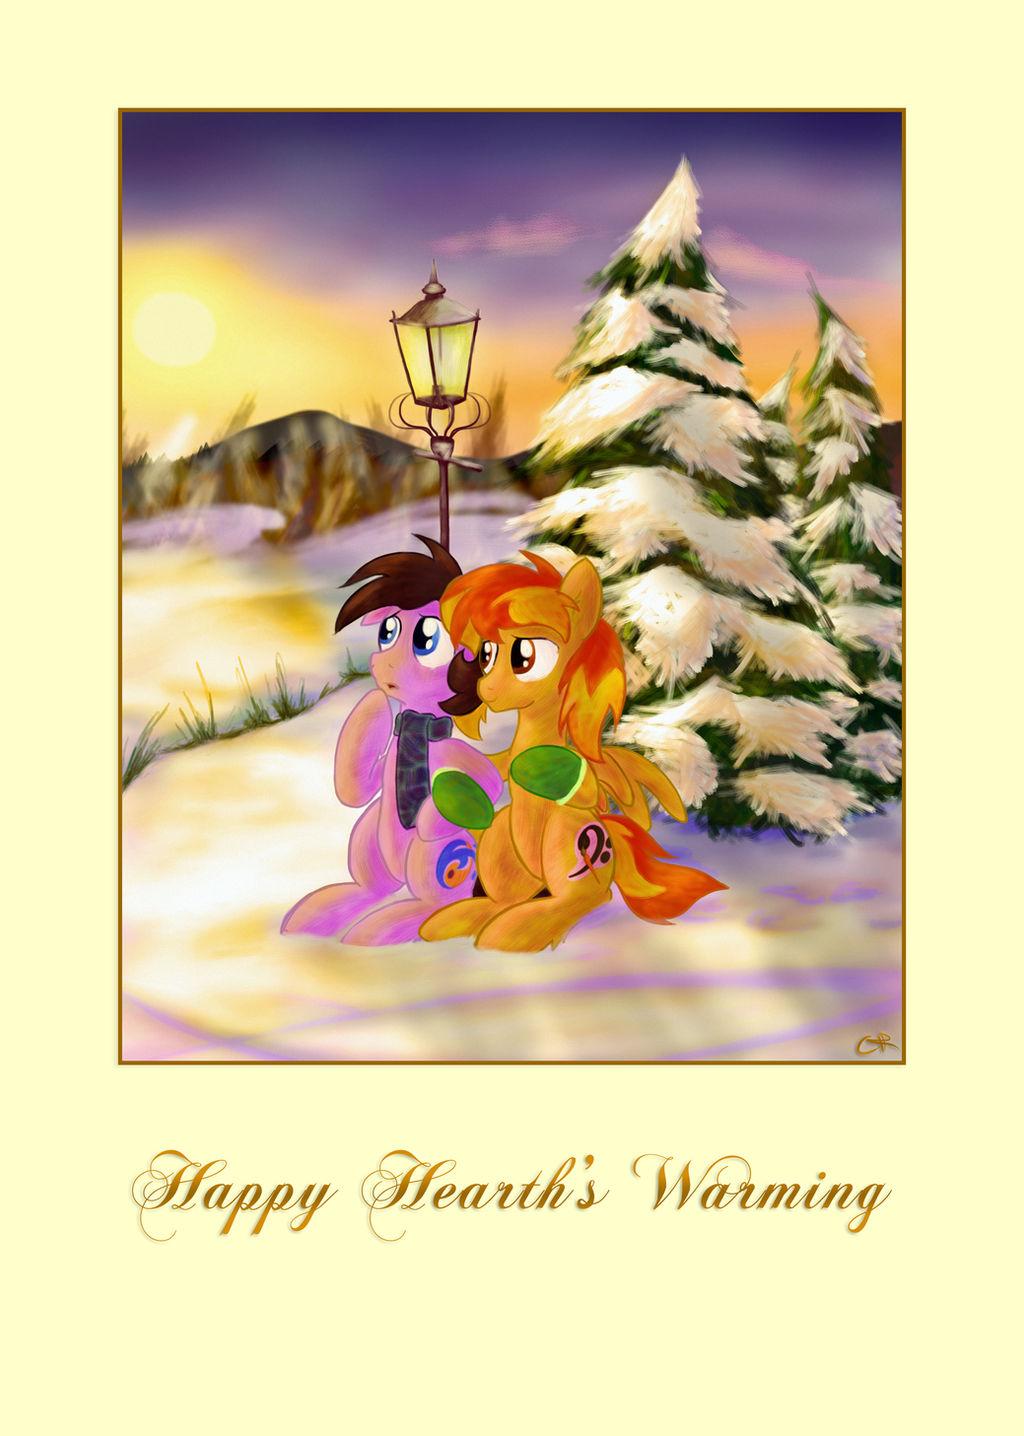 Seasons Greetings from Suncord by stec-corduroyroad